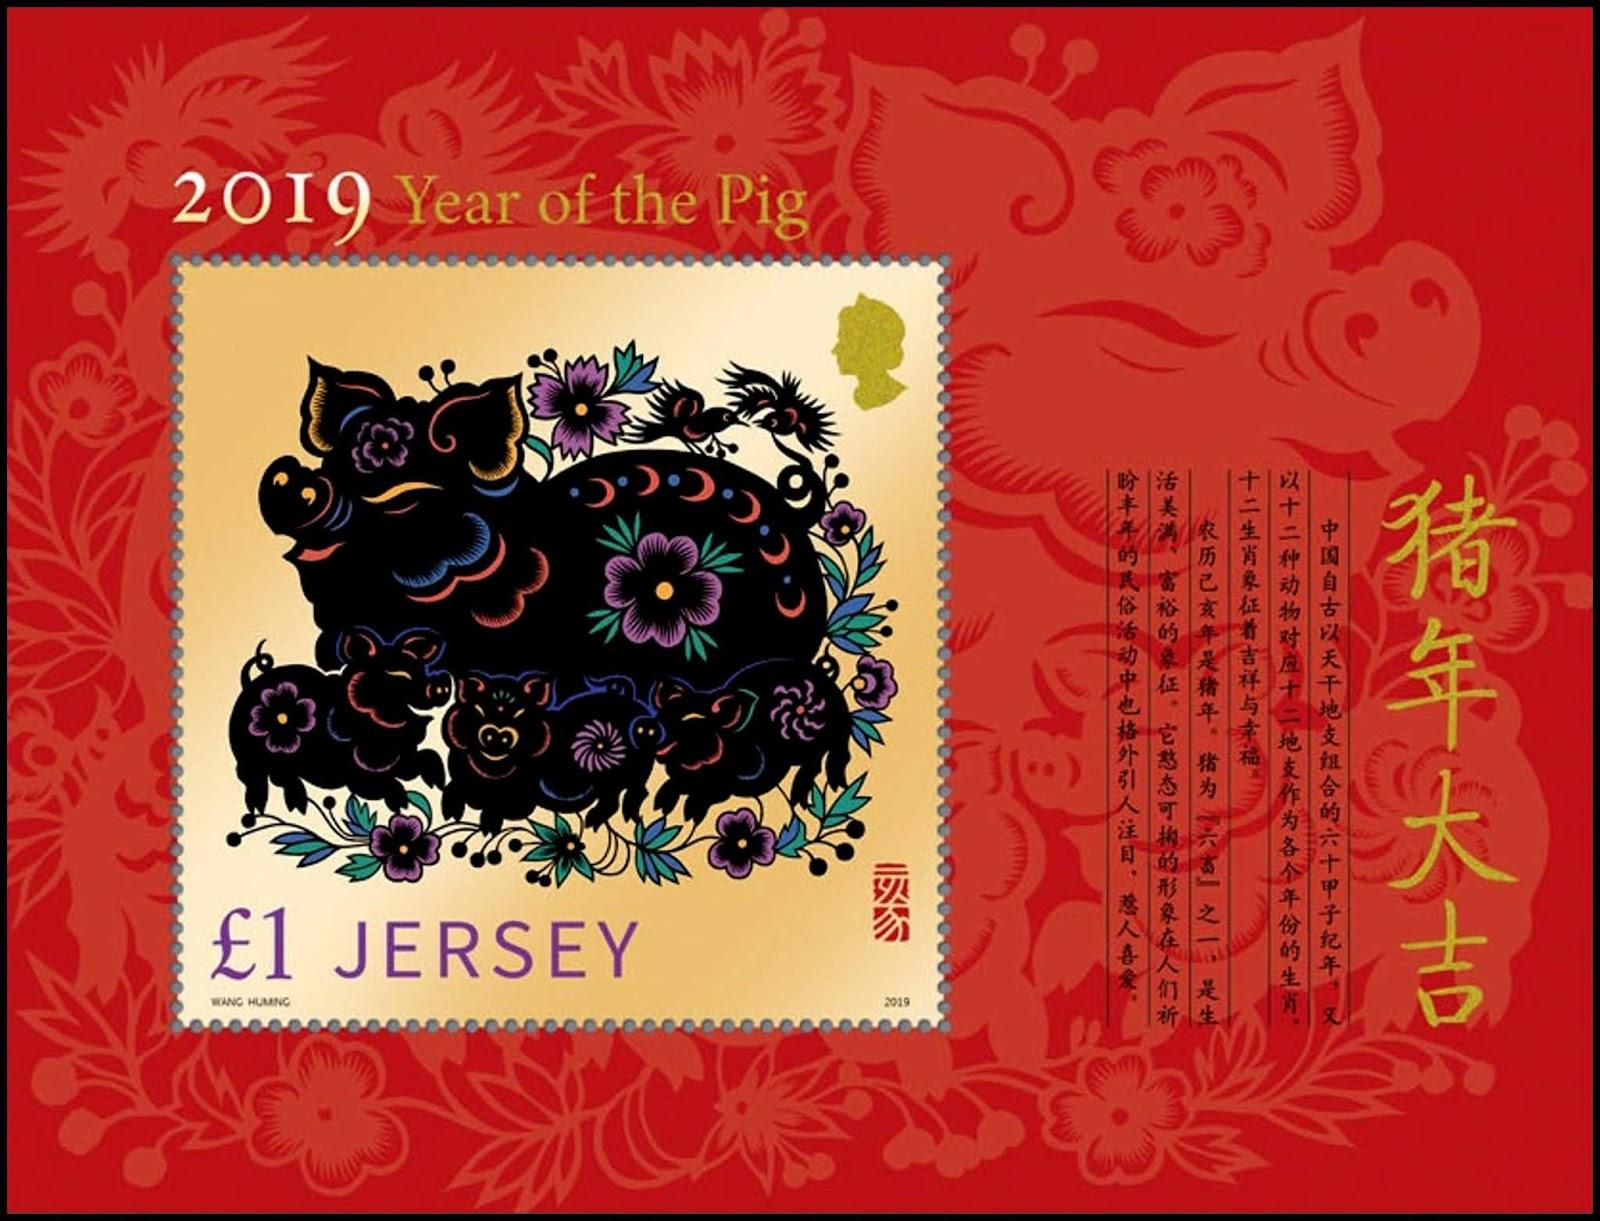 Jersey - Year of the Pig (January 4, 2019) souvenir sheet